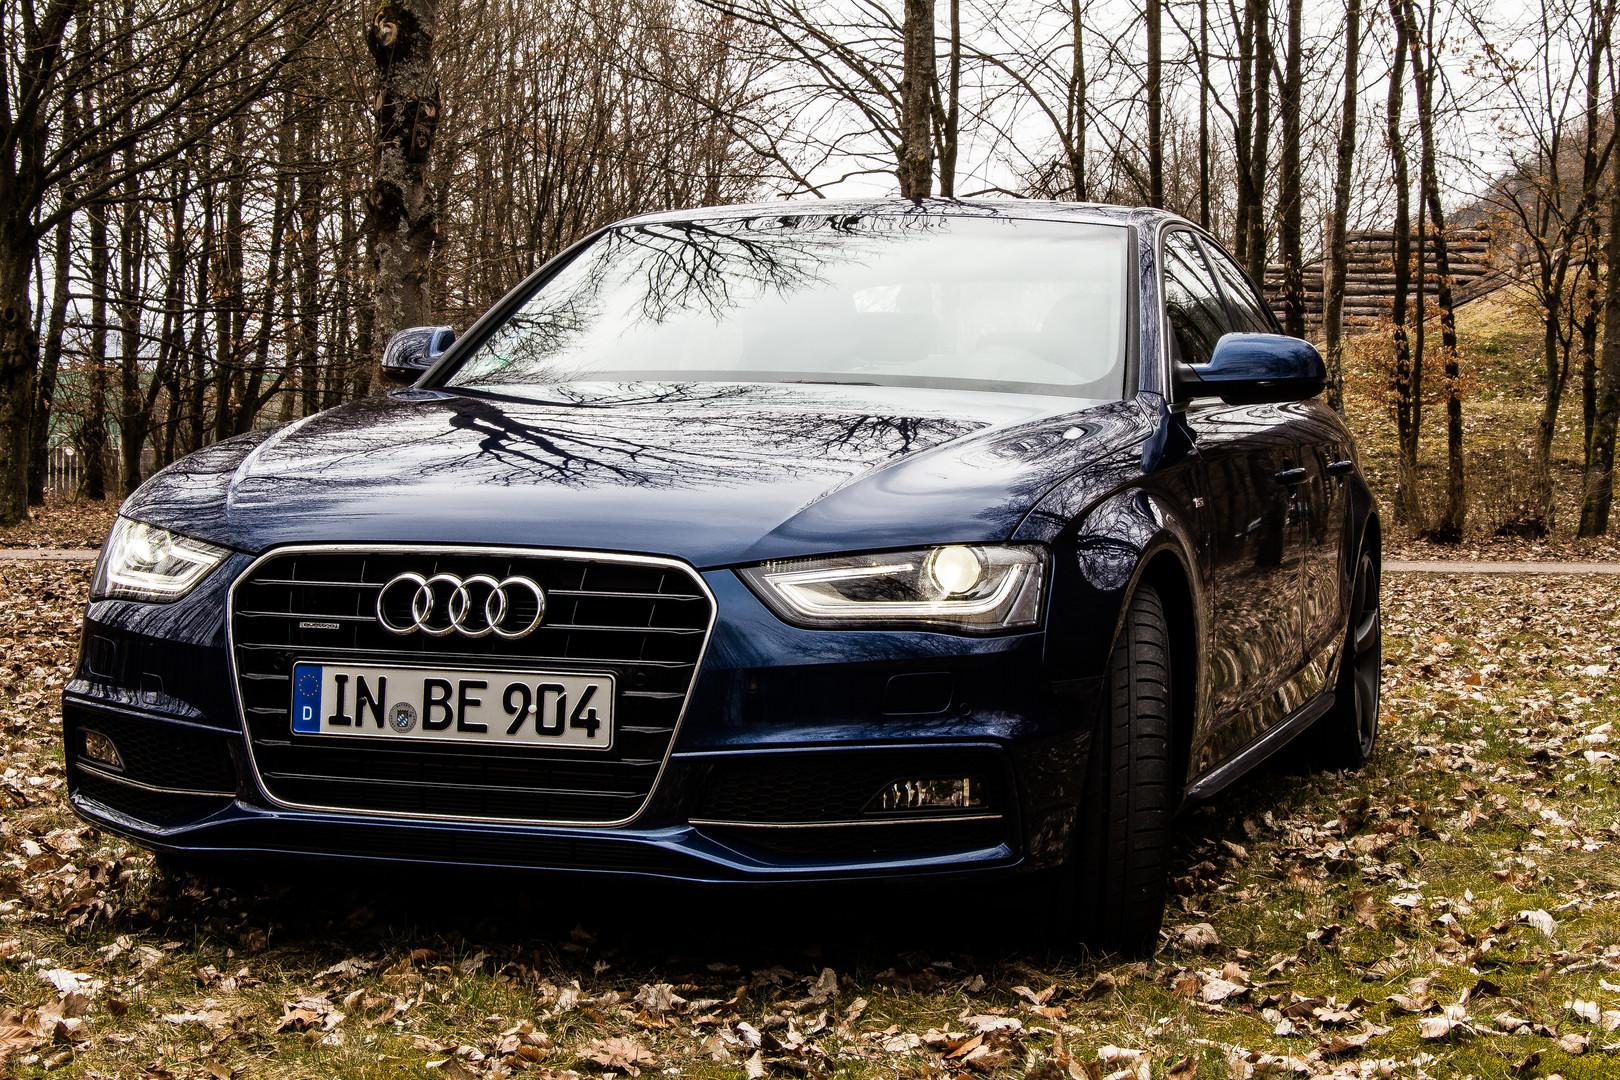 Audi A4 3.0 TFSI Quattro